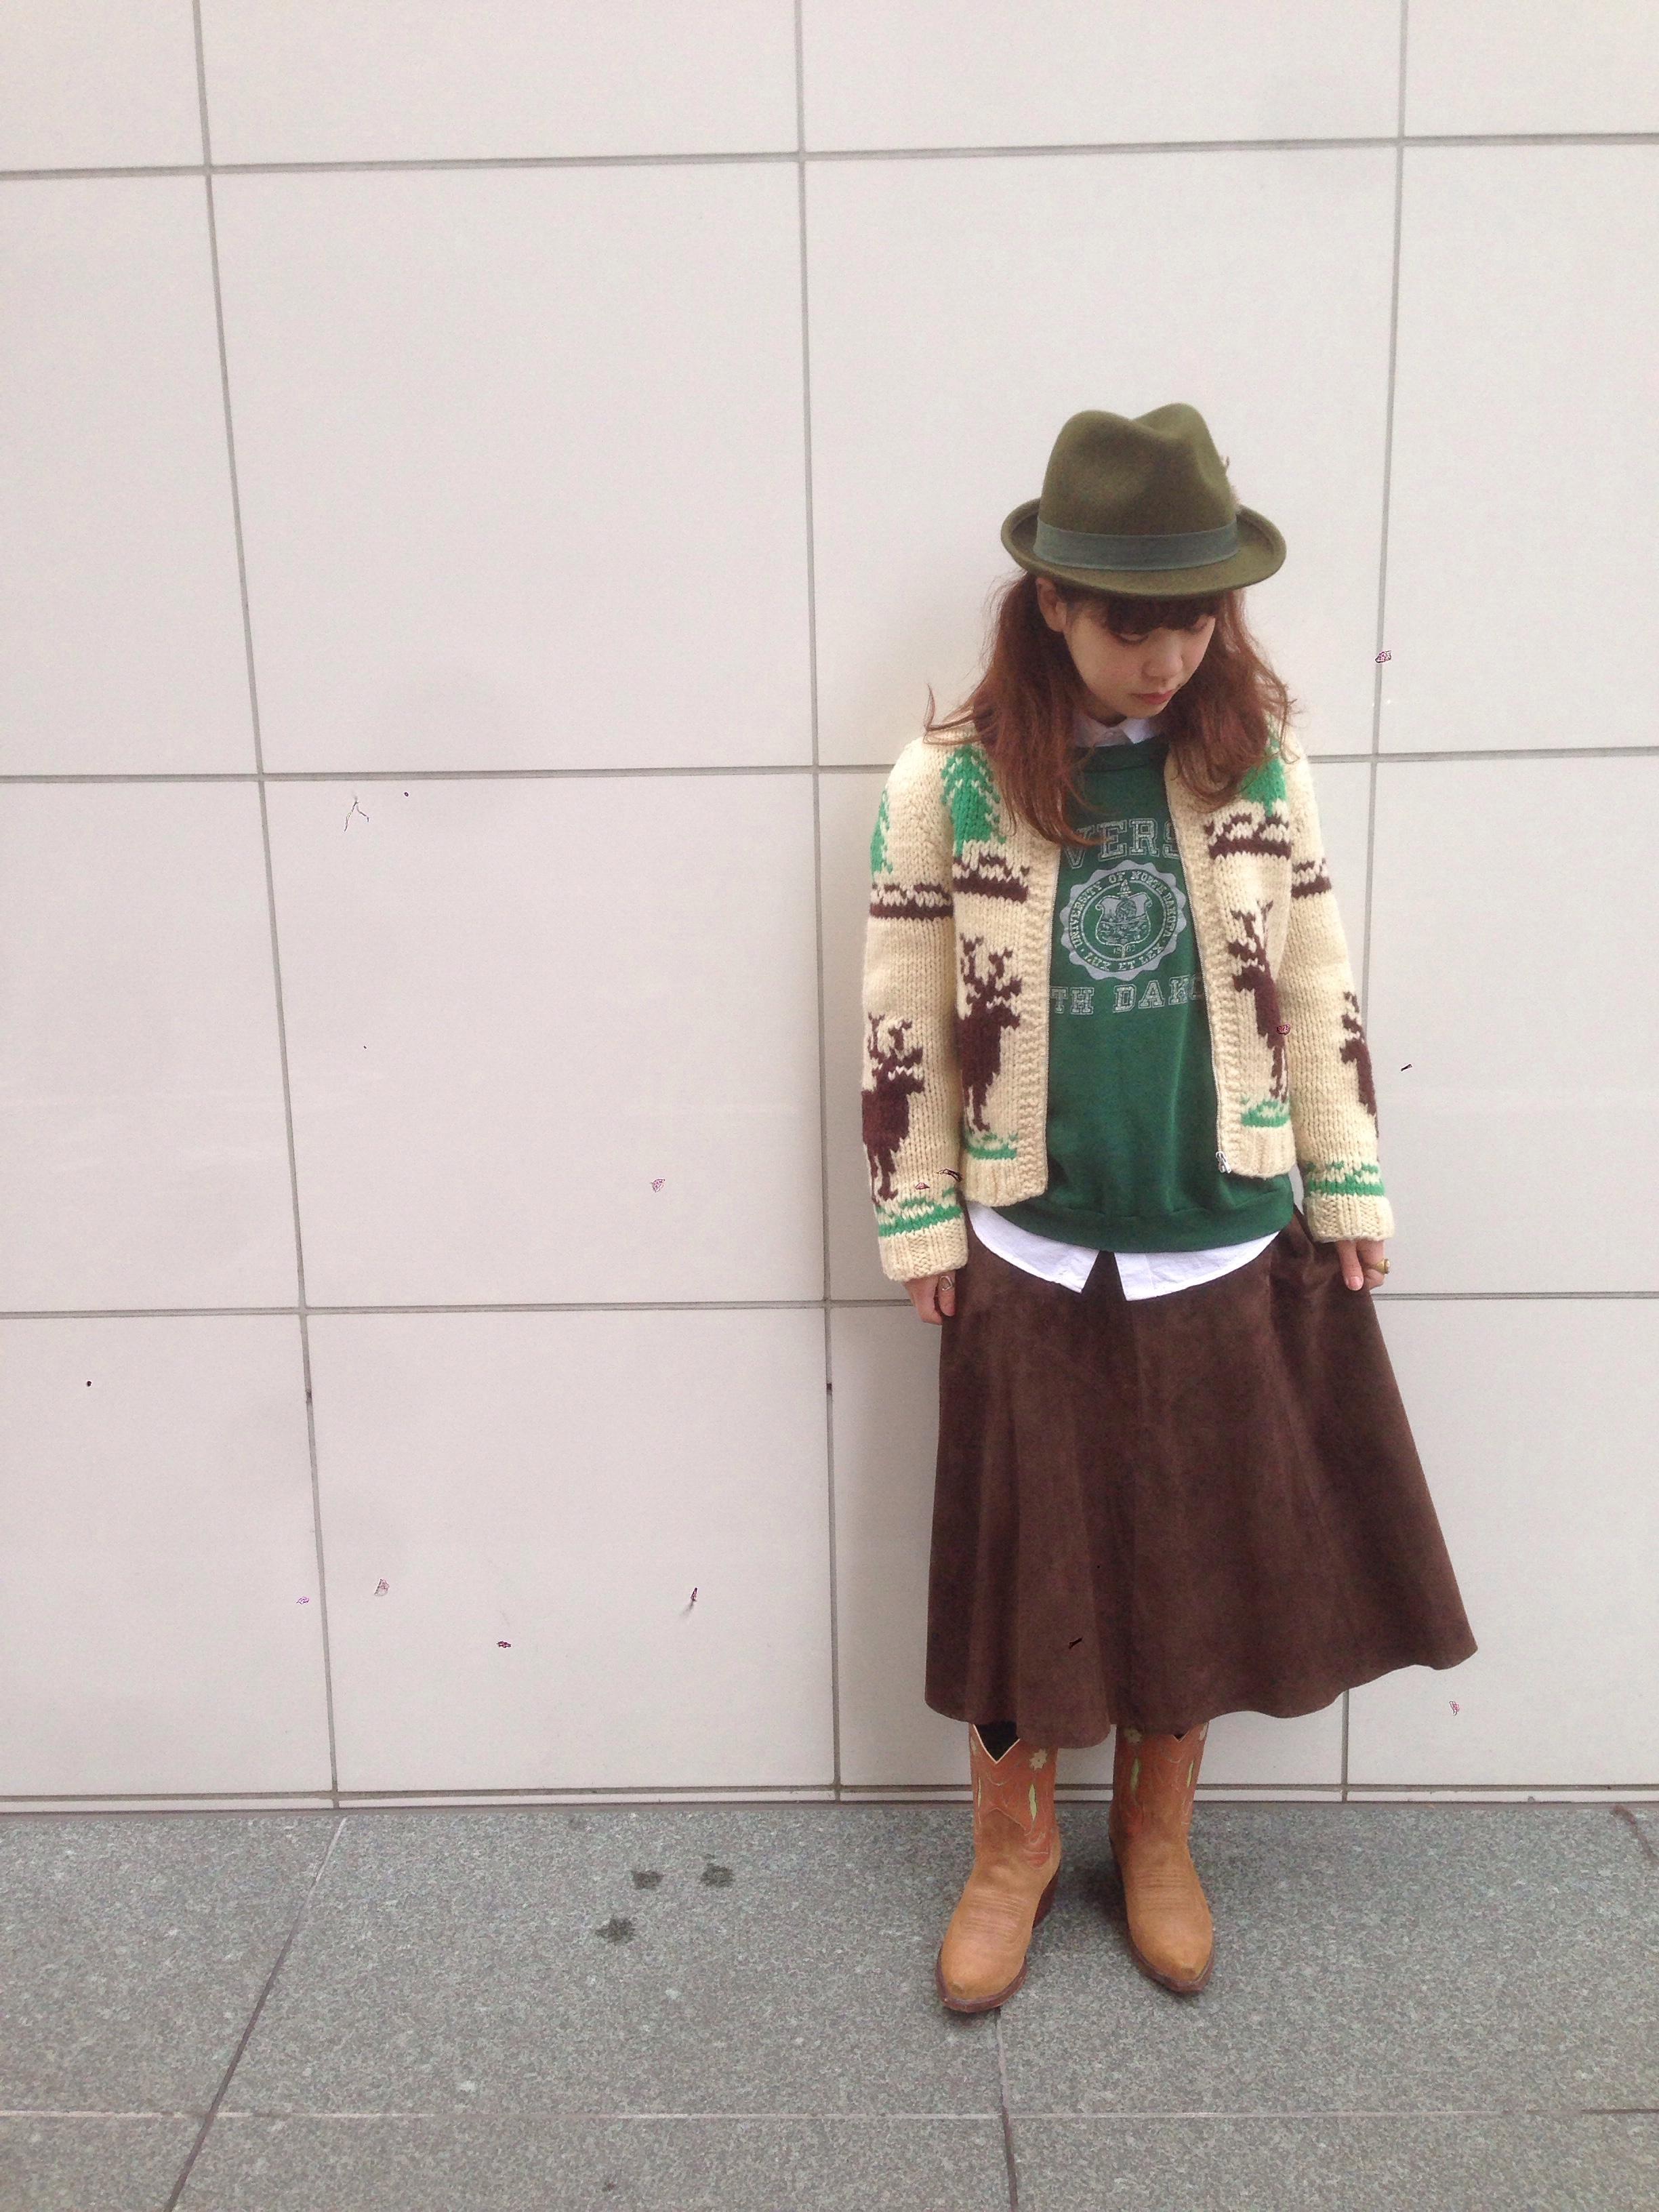 fc2blog_20161121153918a76.jpg